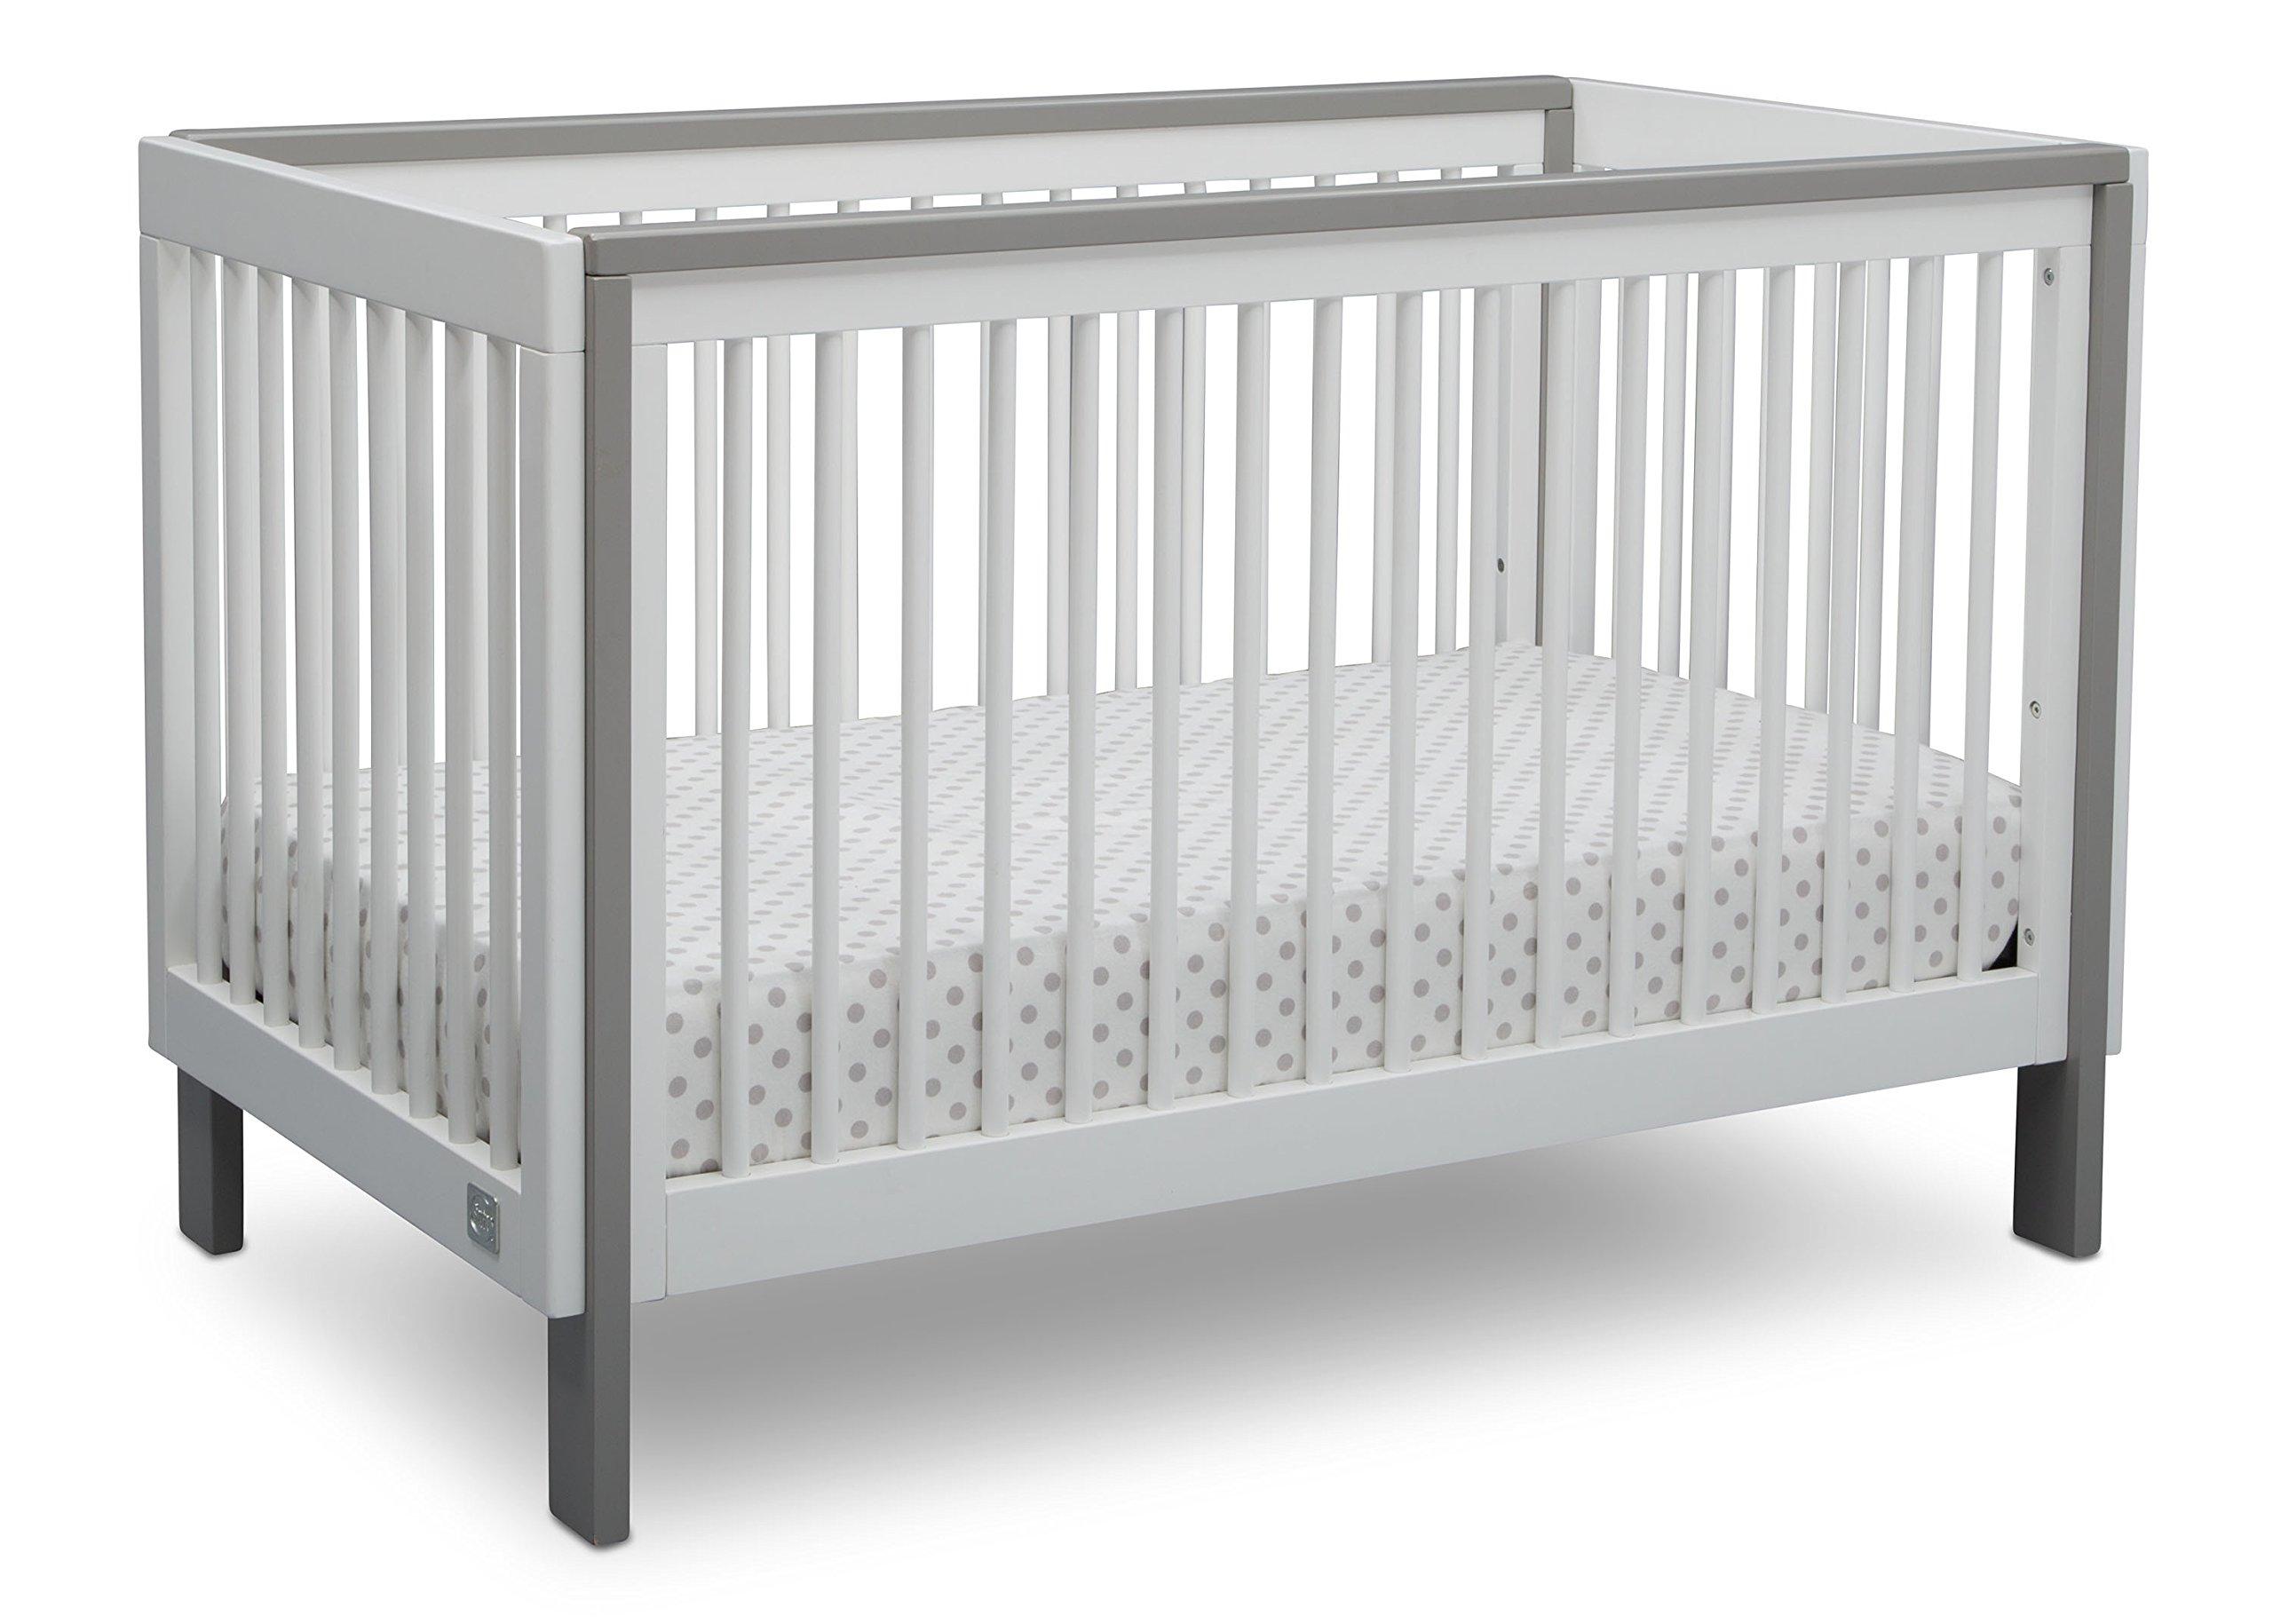 Serta Fremont 3-in-1 Convertible Crib